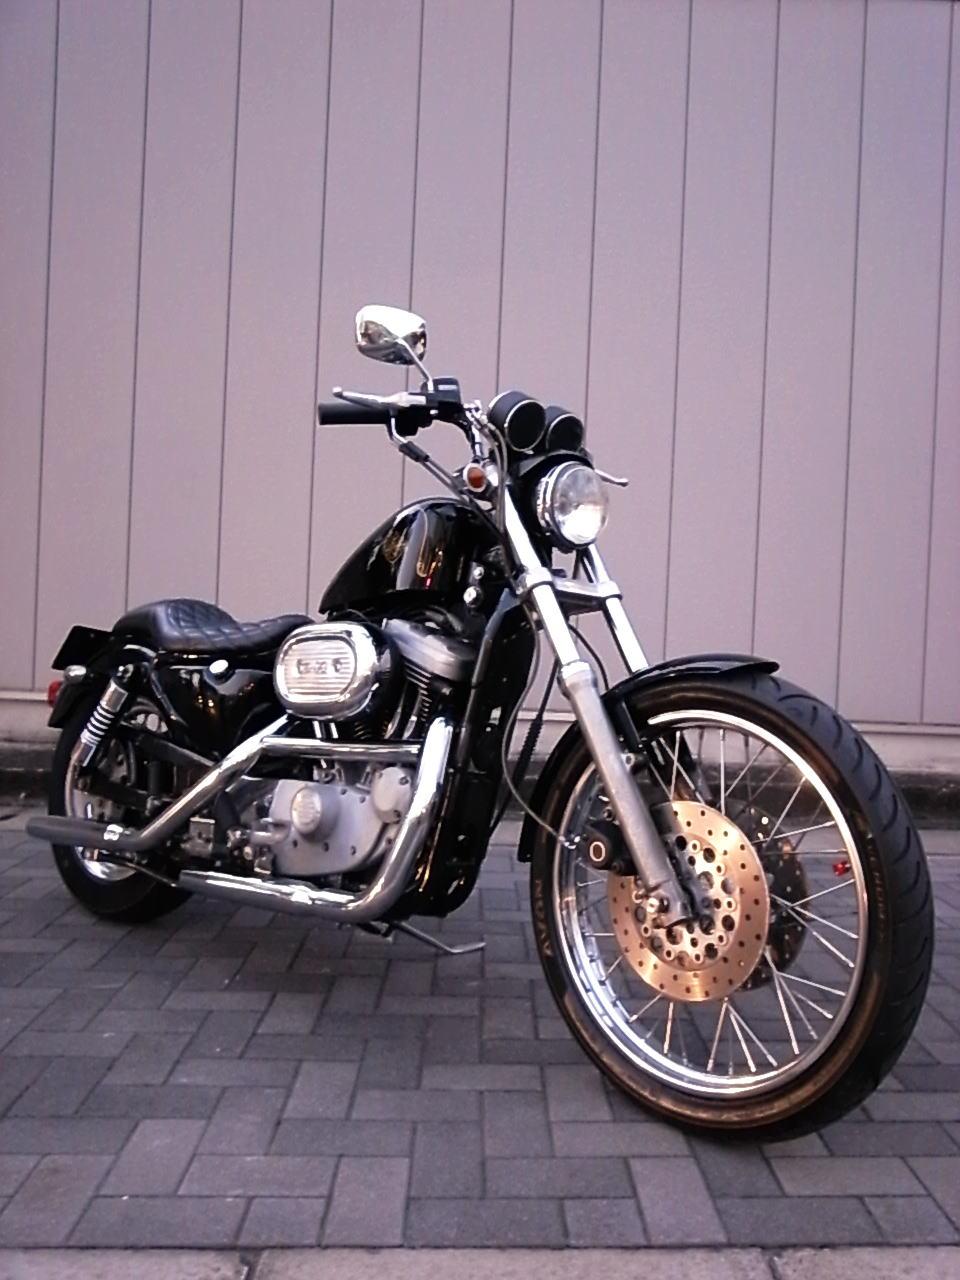 Harley Davidson XL1200S_b0160319_13275854.jpg